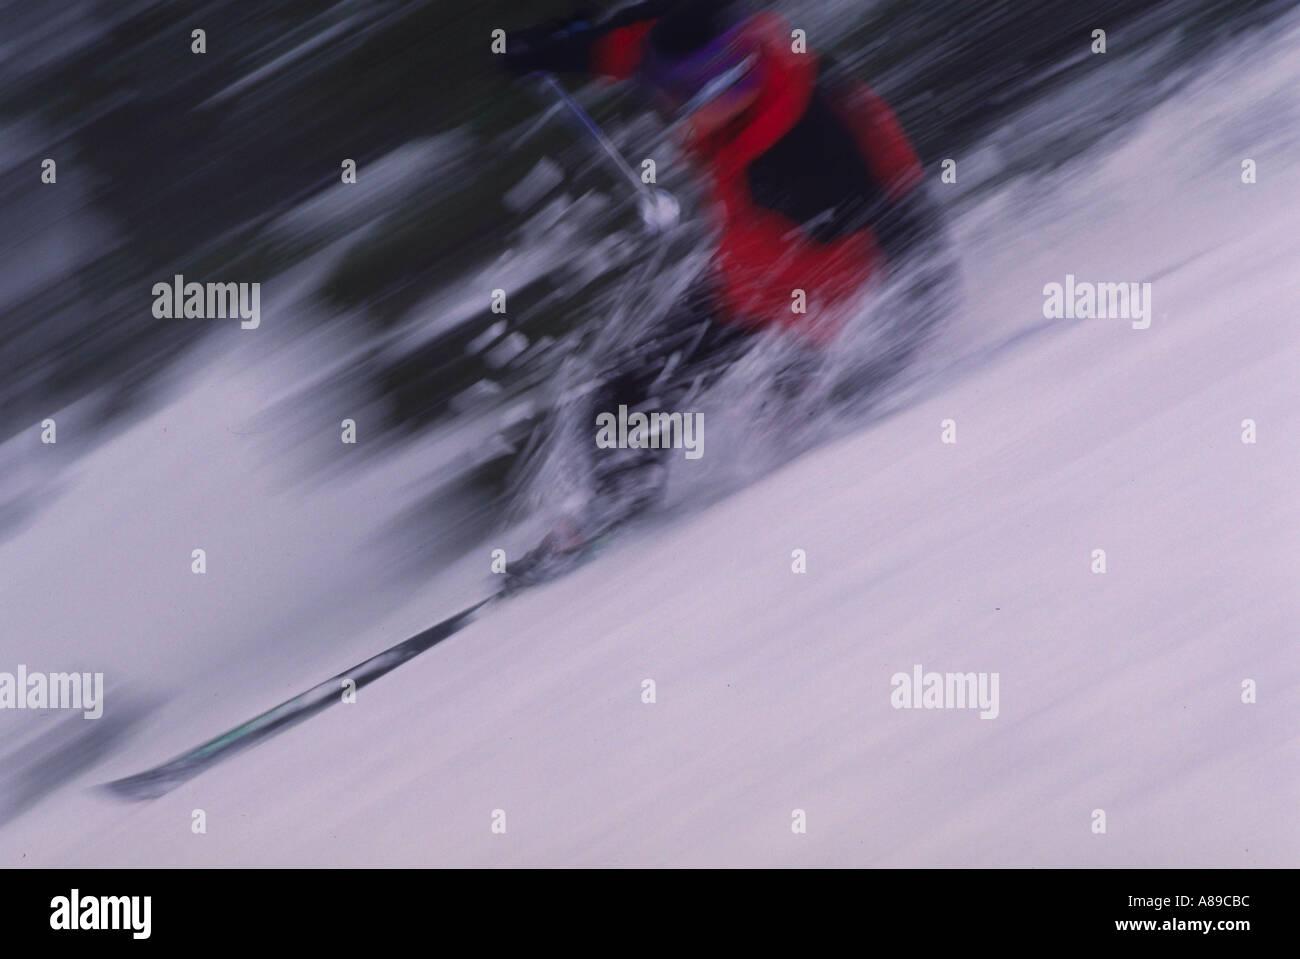 Blurred skiier Mt Hood Meadows - Stock Image